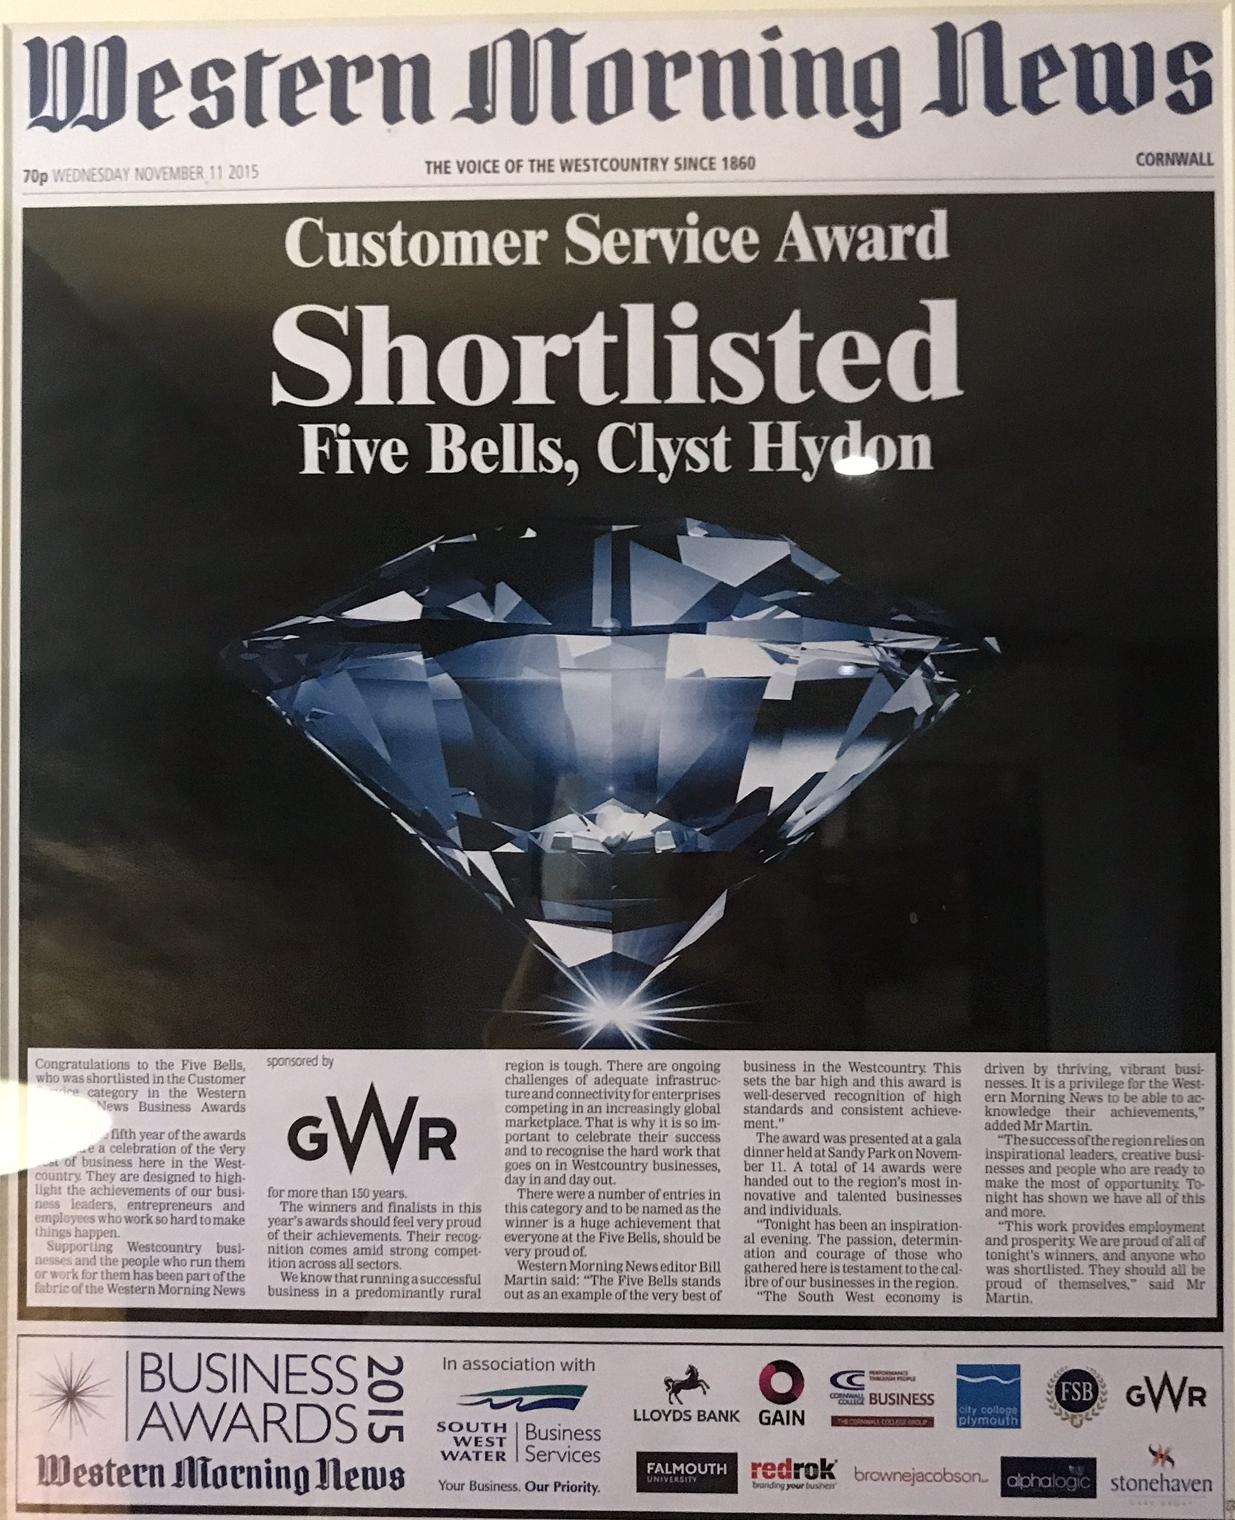 Western Morning News shortlisted for Customer Service Award